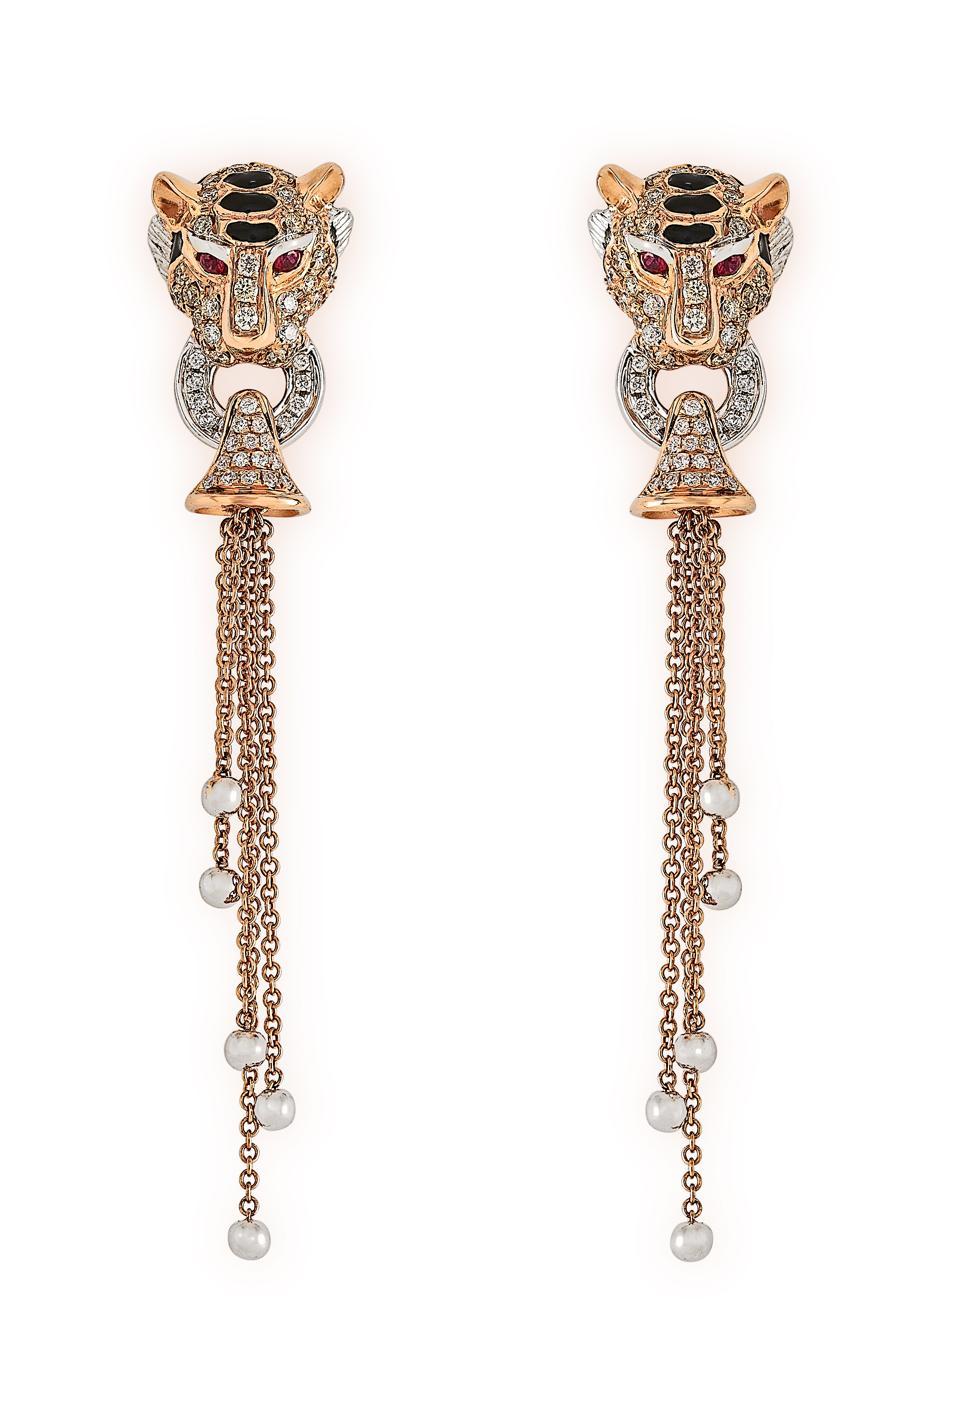 Tiger earrings by Susannah Lovis